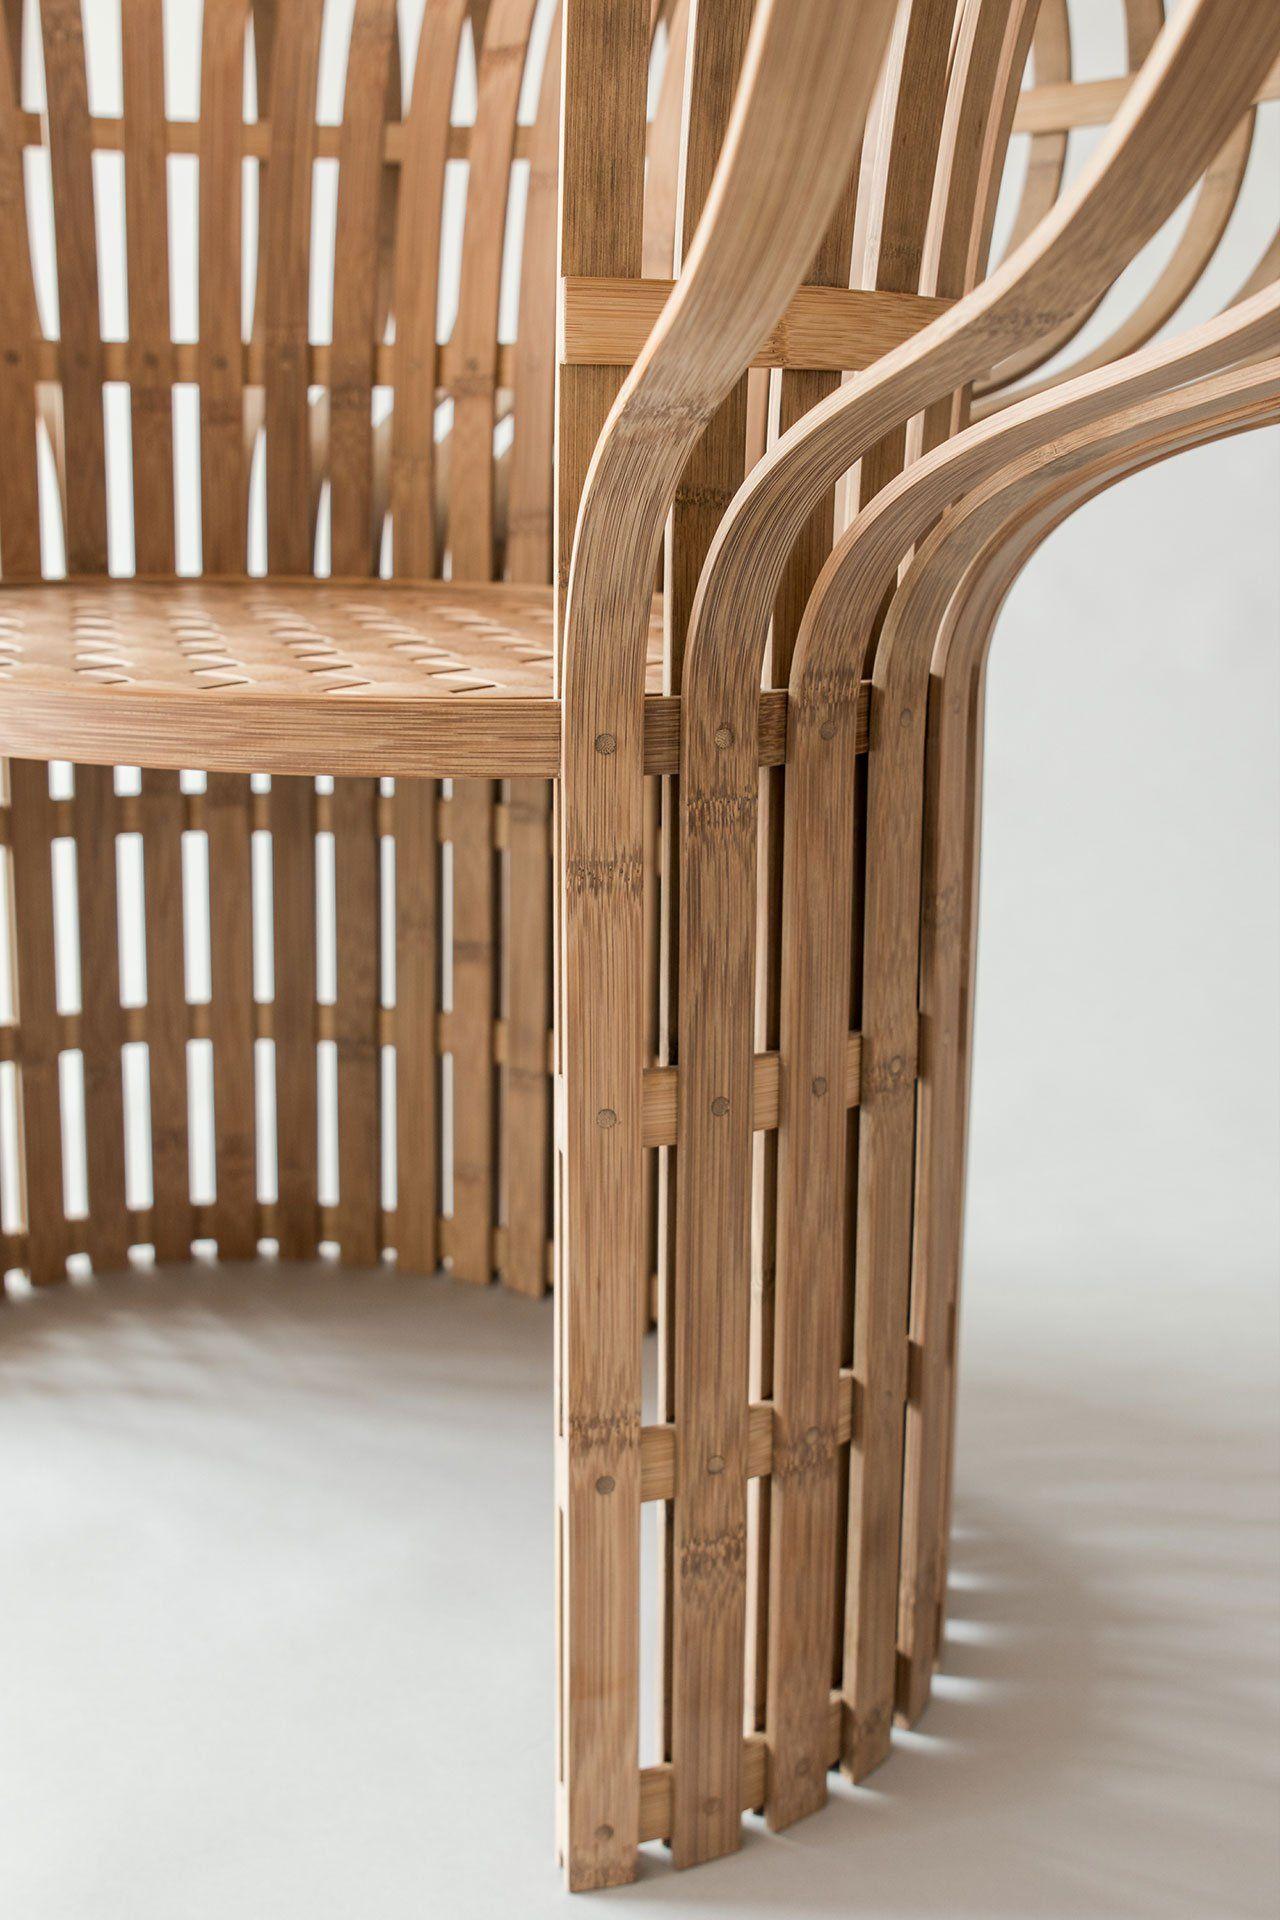 The Indigo-Dyed Bamboo Chair, designed byJin Kuramoto(Japan).Craftsmen : Lin, Jian Cheng (Taiwan), Tang, Wen-Chun (Taiwan).Photo by Maciej Korbas (Poland) / Courtesy NTCRI & Taiwan Designers Web.